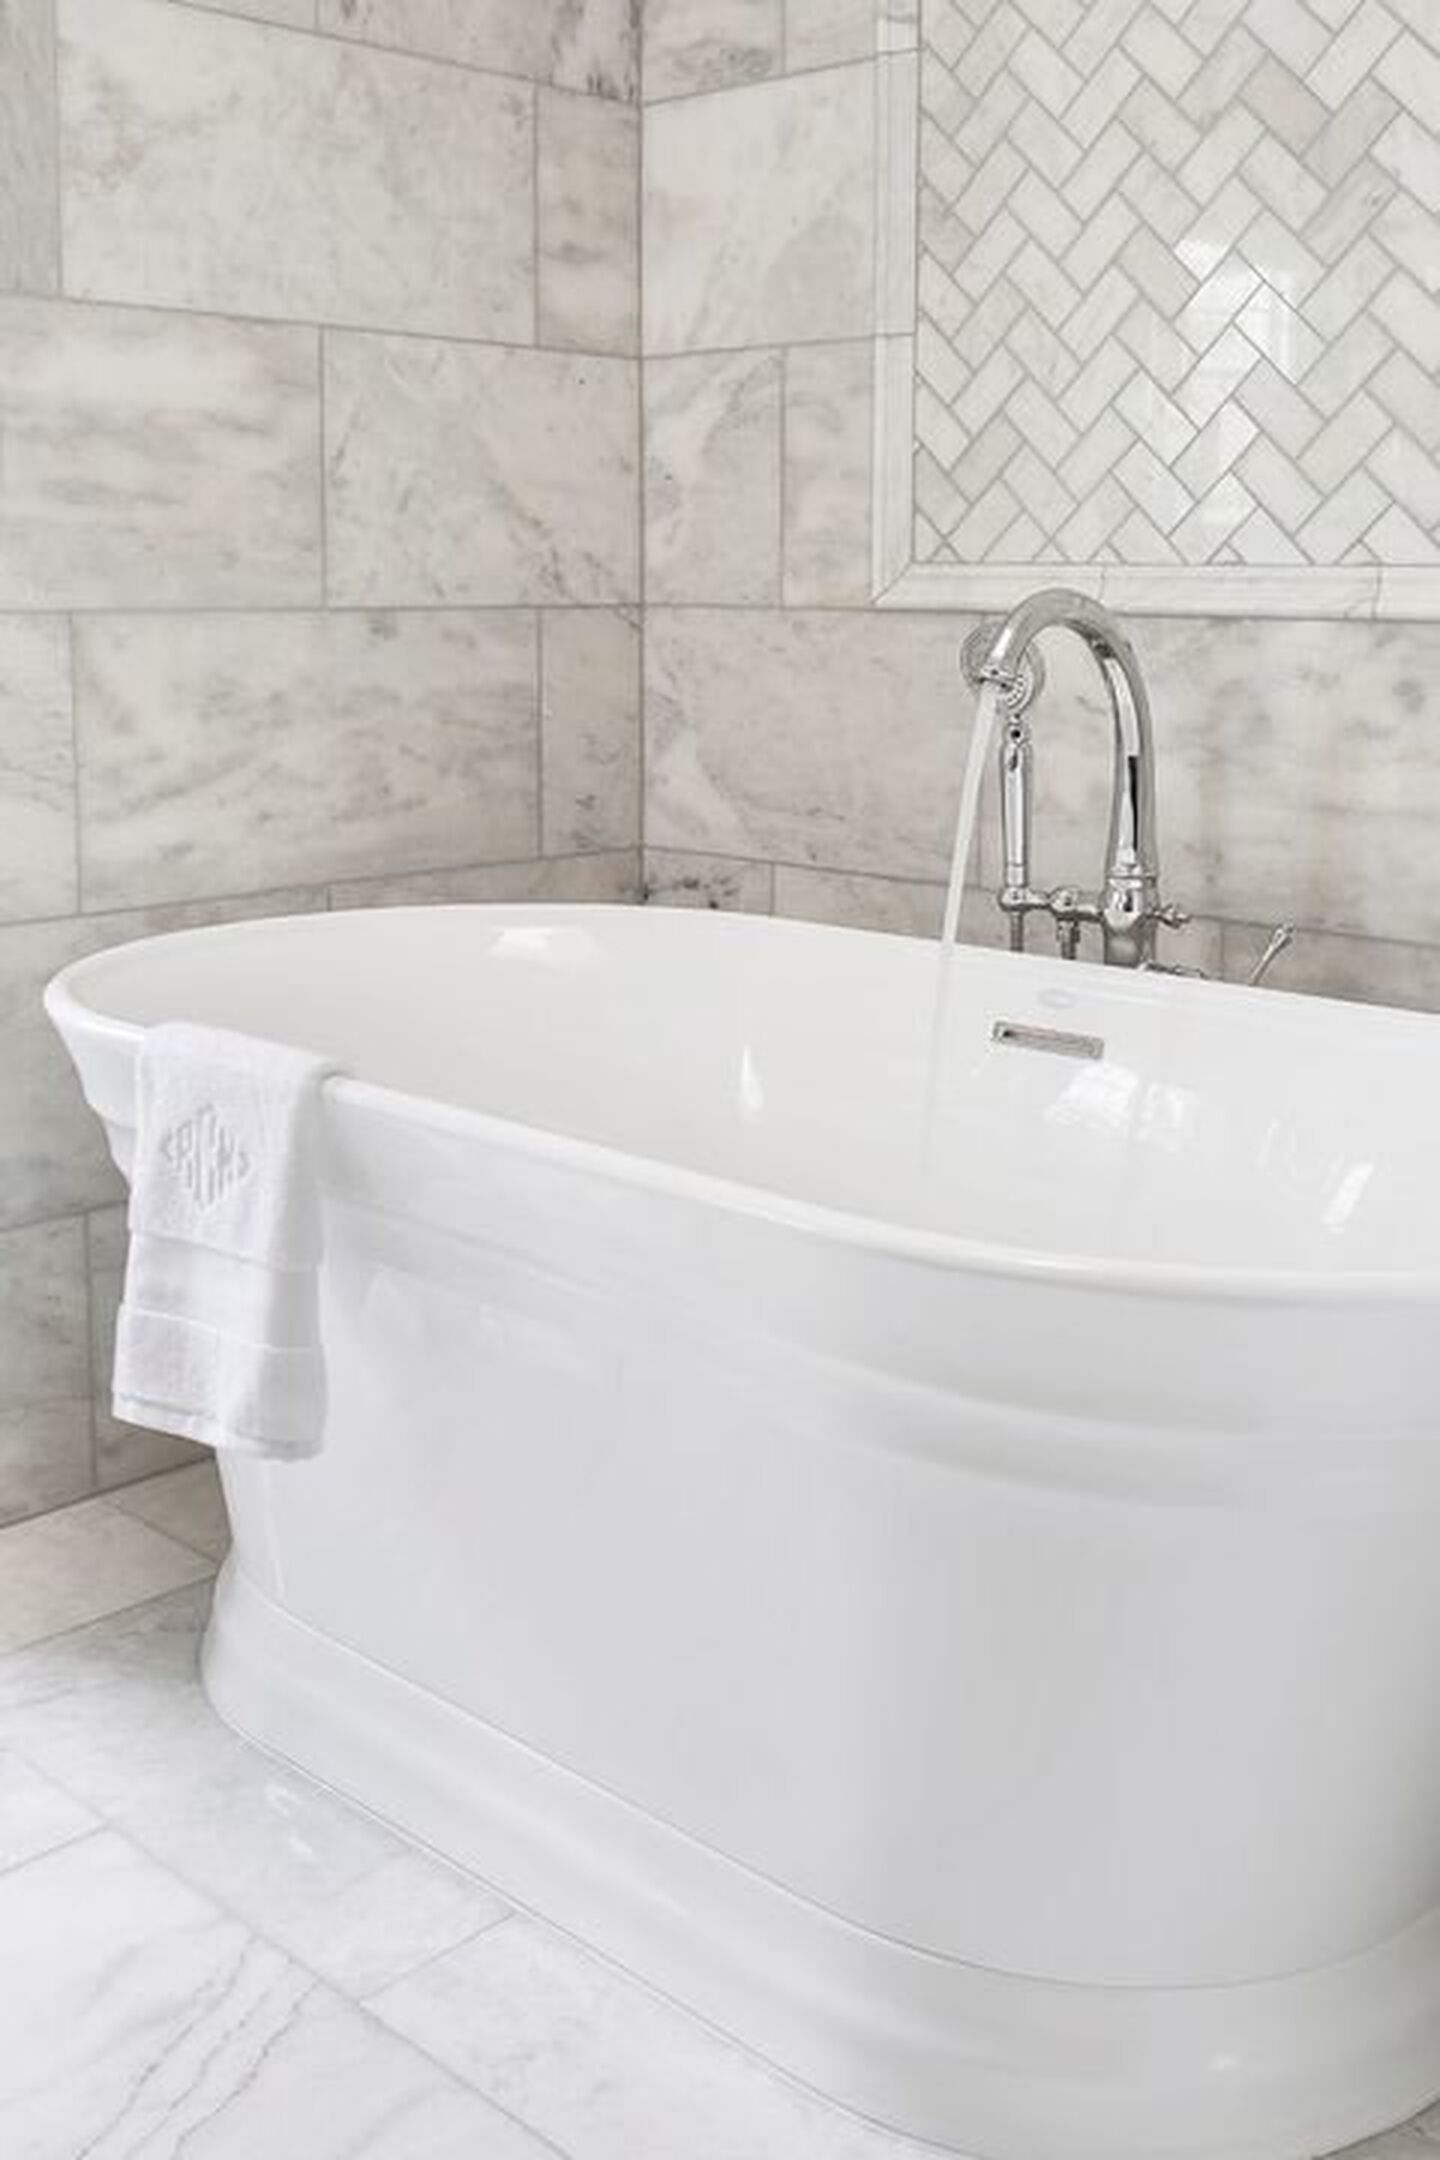 The Serafina Freestanding tub